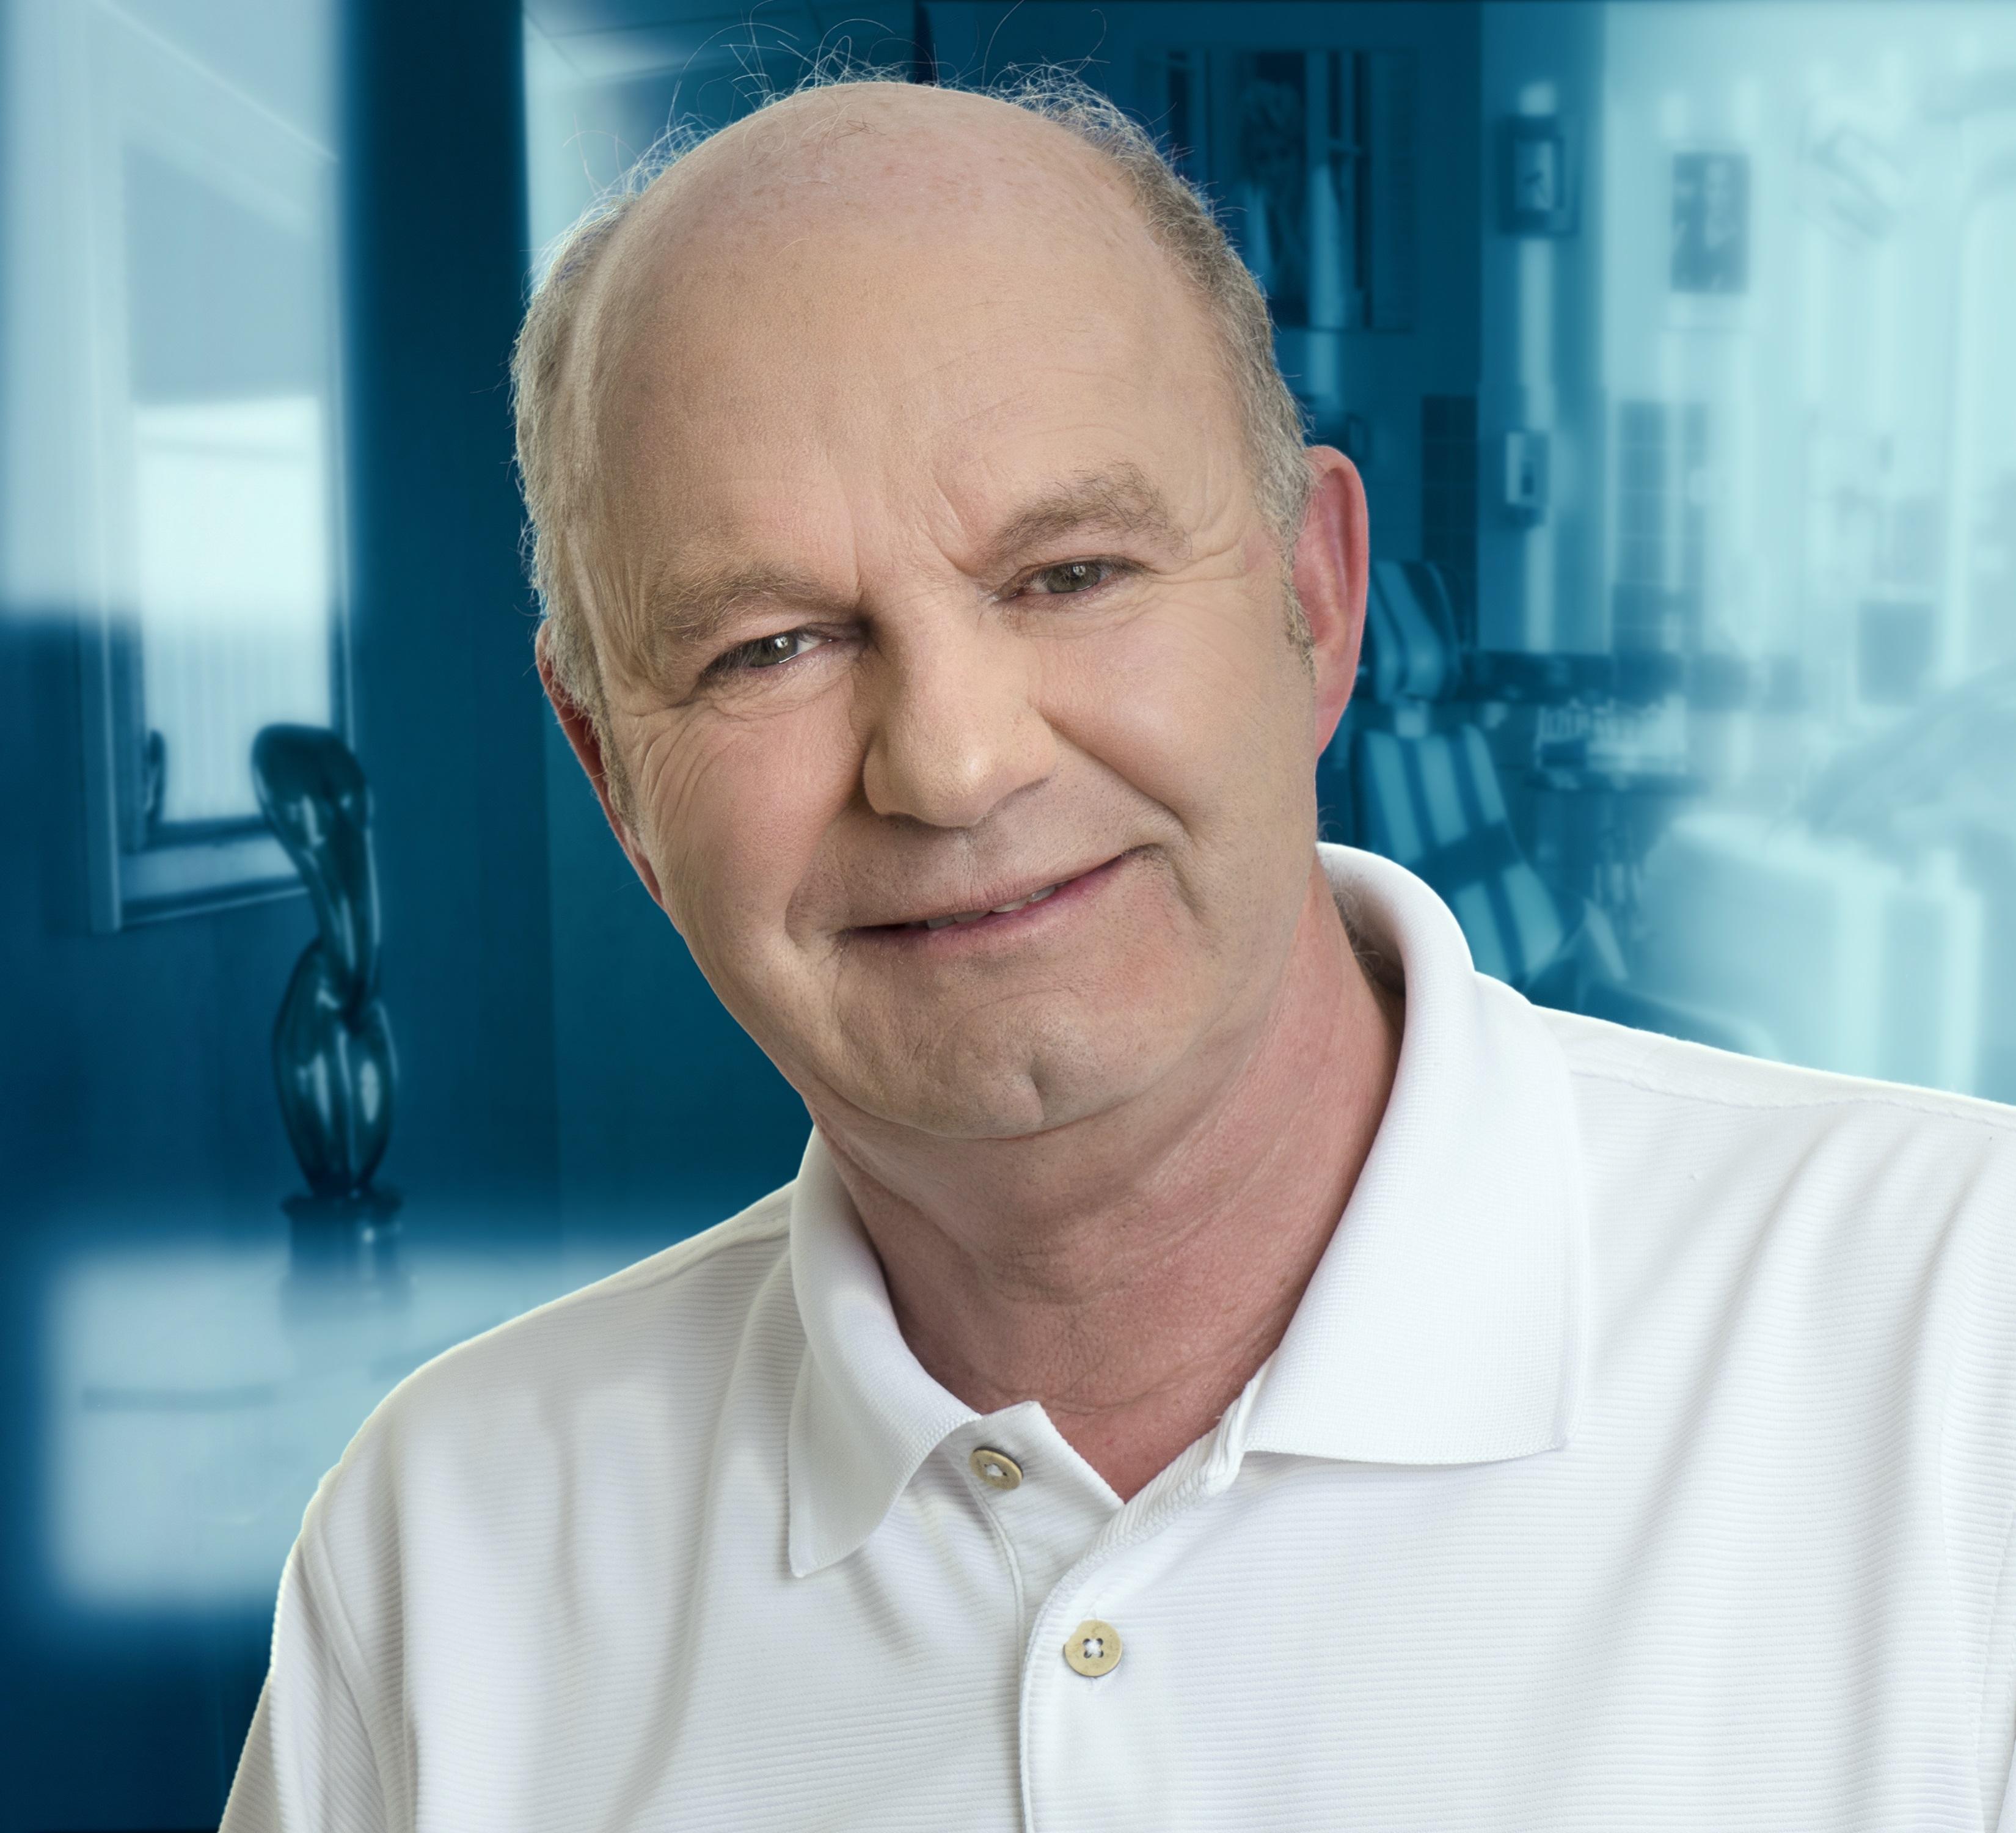 Dr Endre LANTOS